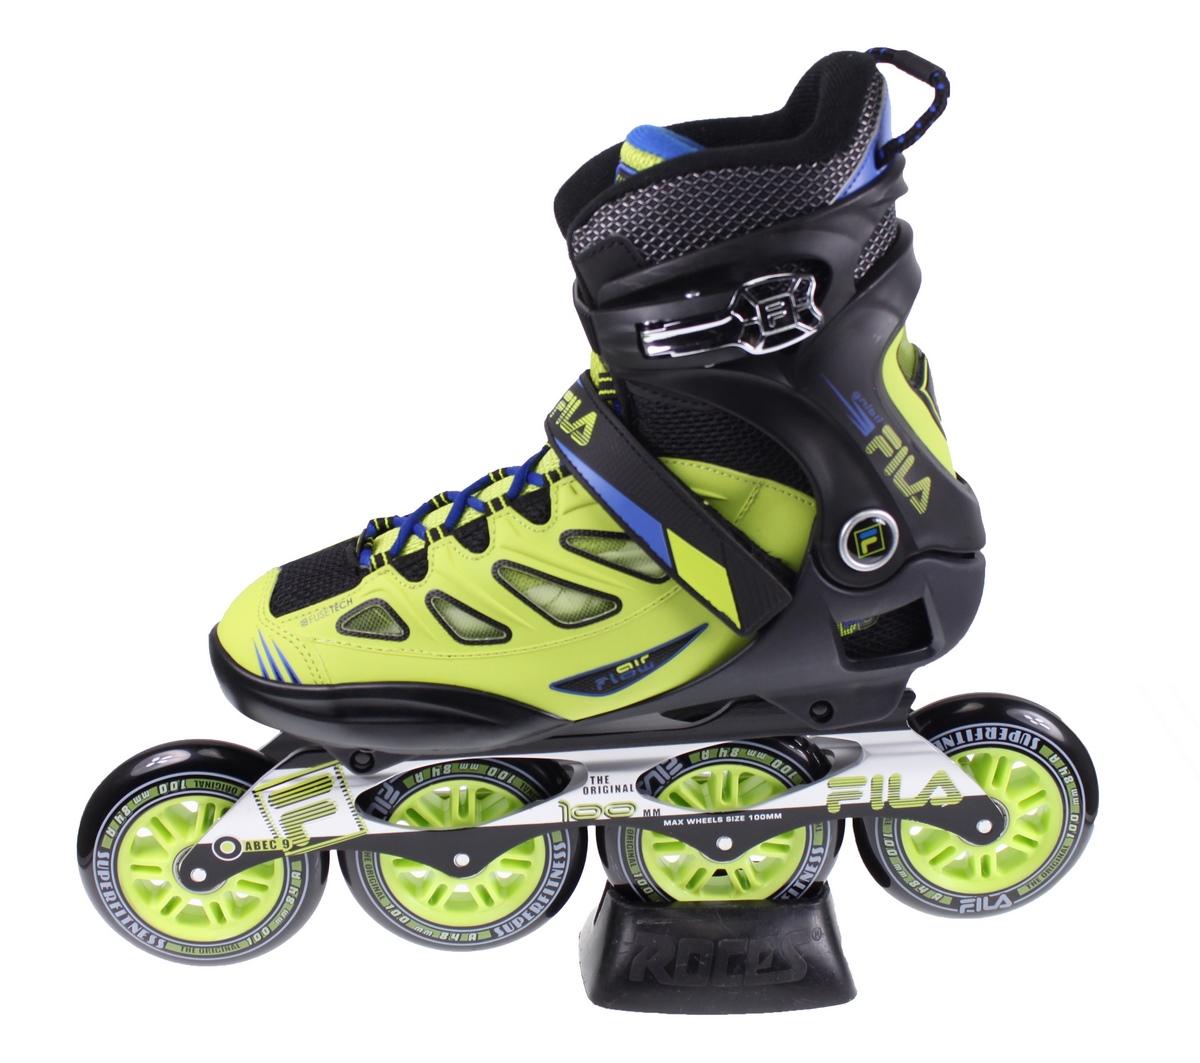 5ffce78ce1e Fila GHIBLI 100 MM Skates ZWART/GROEN online kopen bij Sportpaleis.